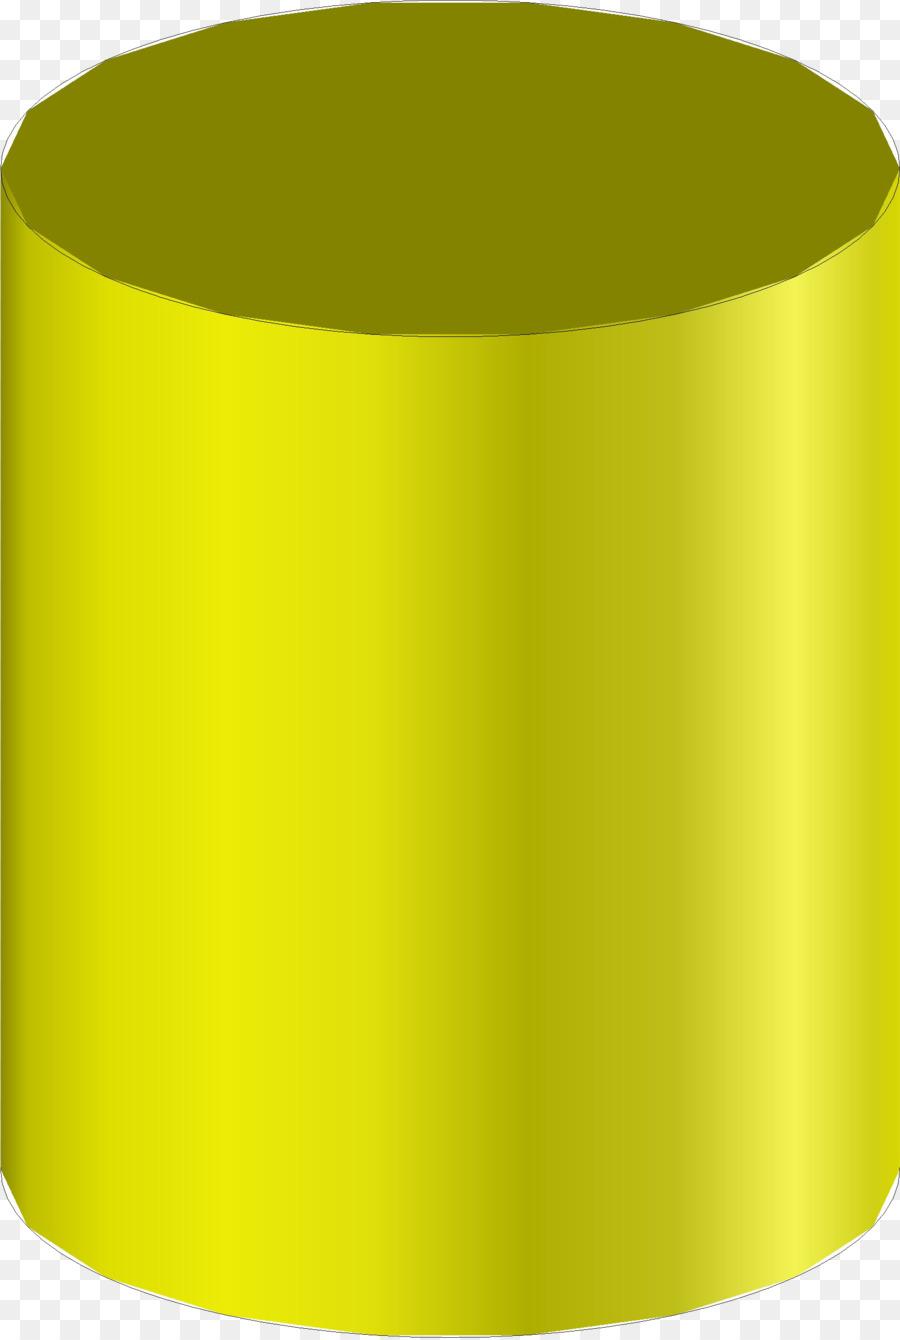 картинка геометрический цилиндр теперь